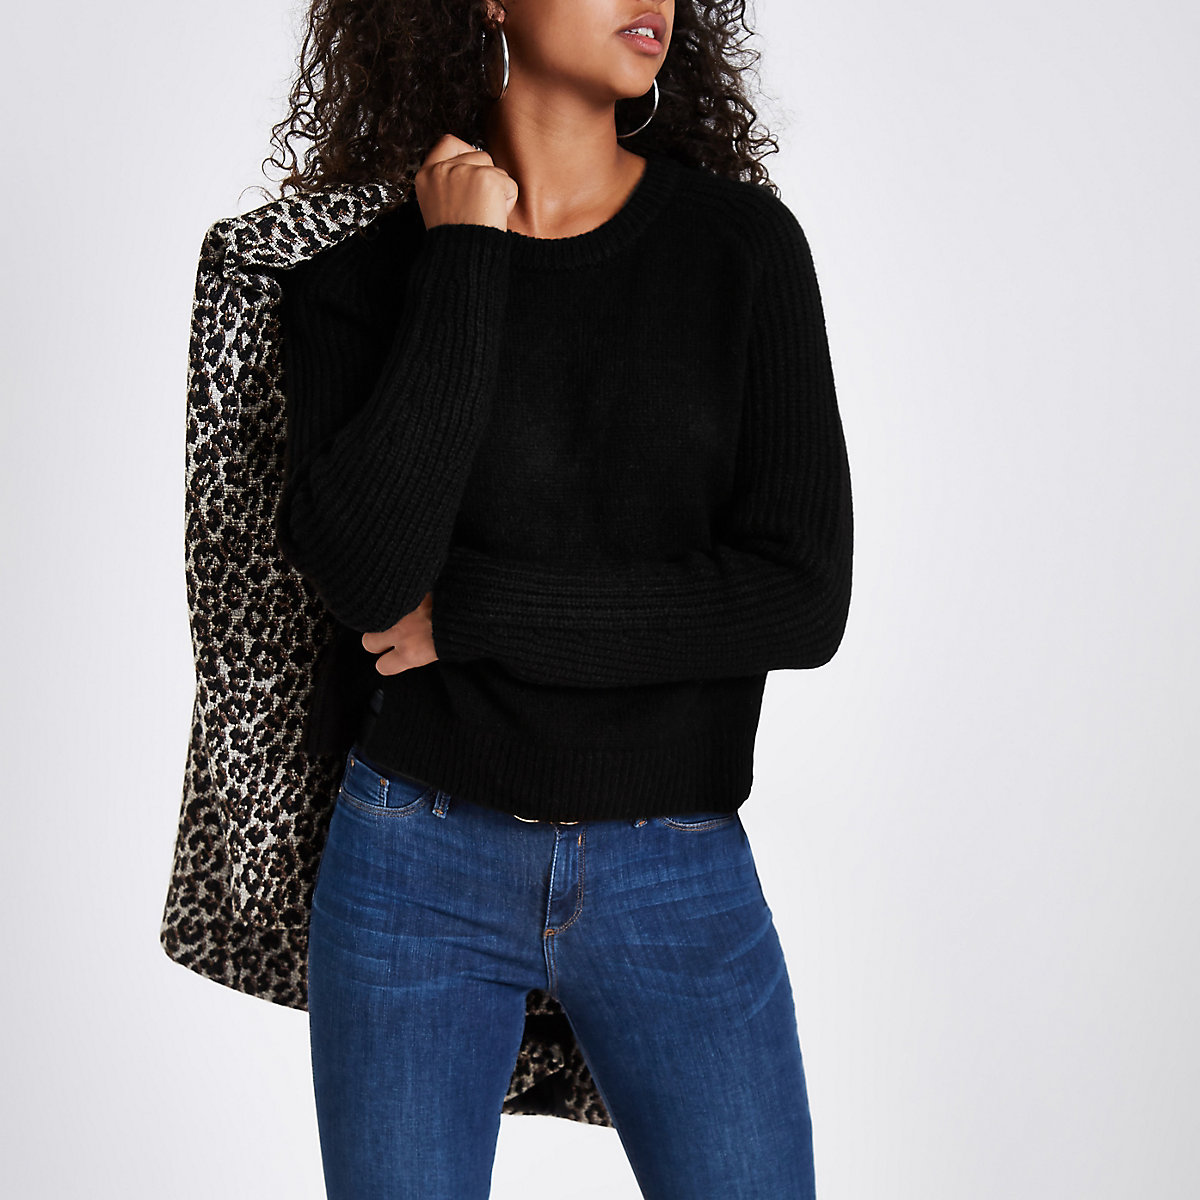 Zwarte cropped pullover met ronde hals